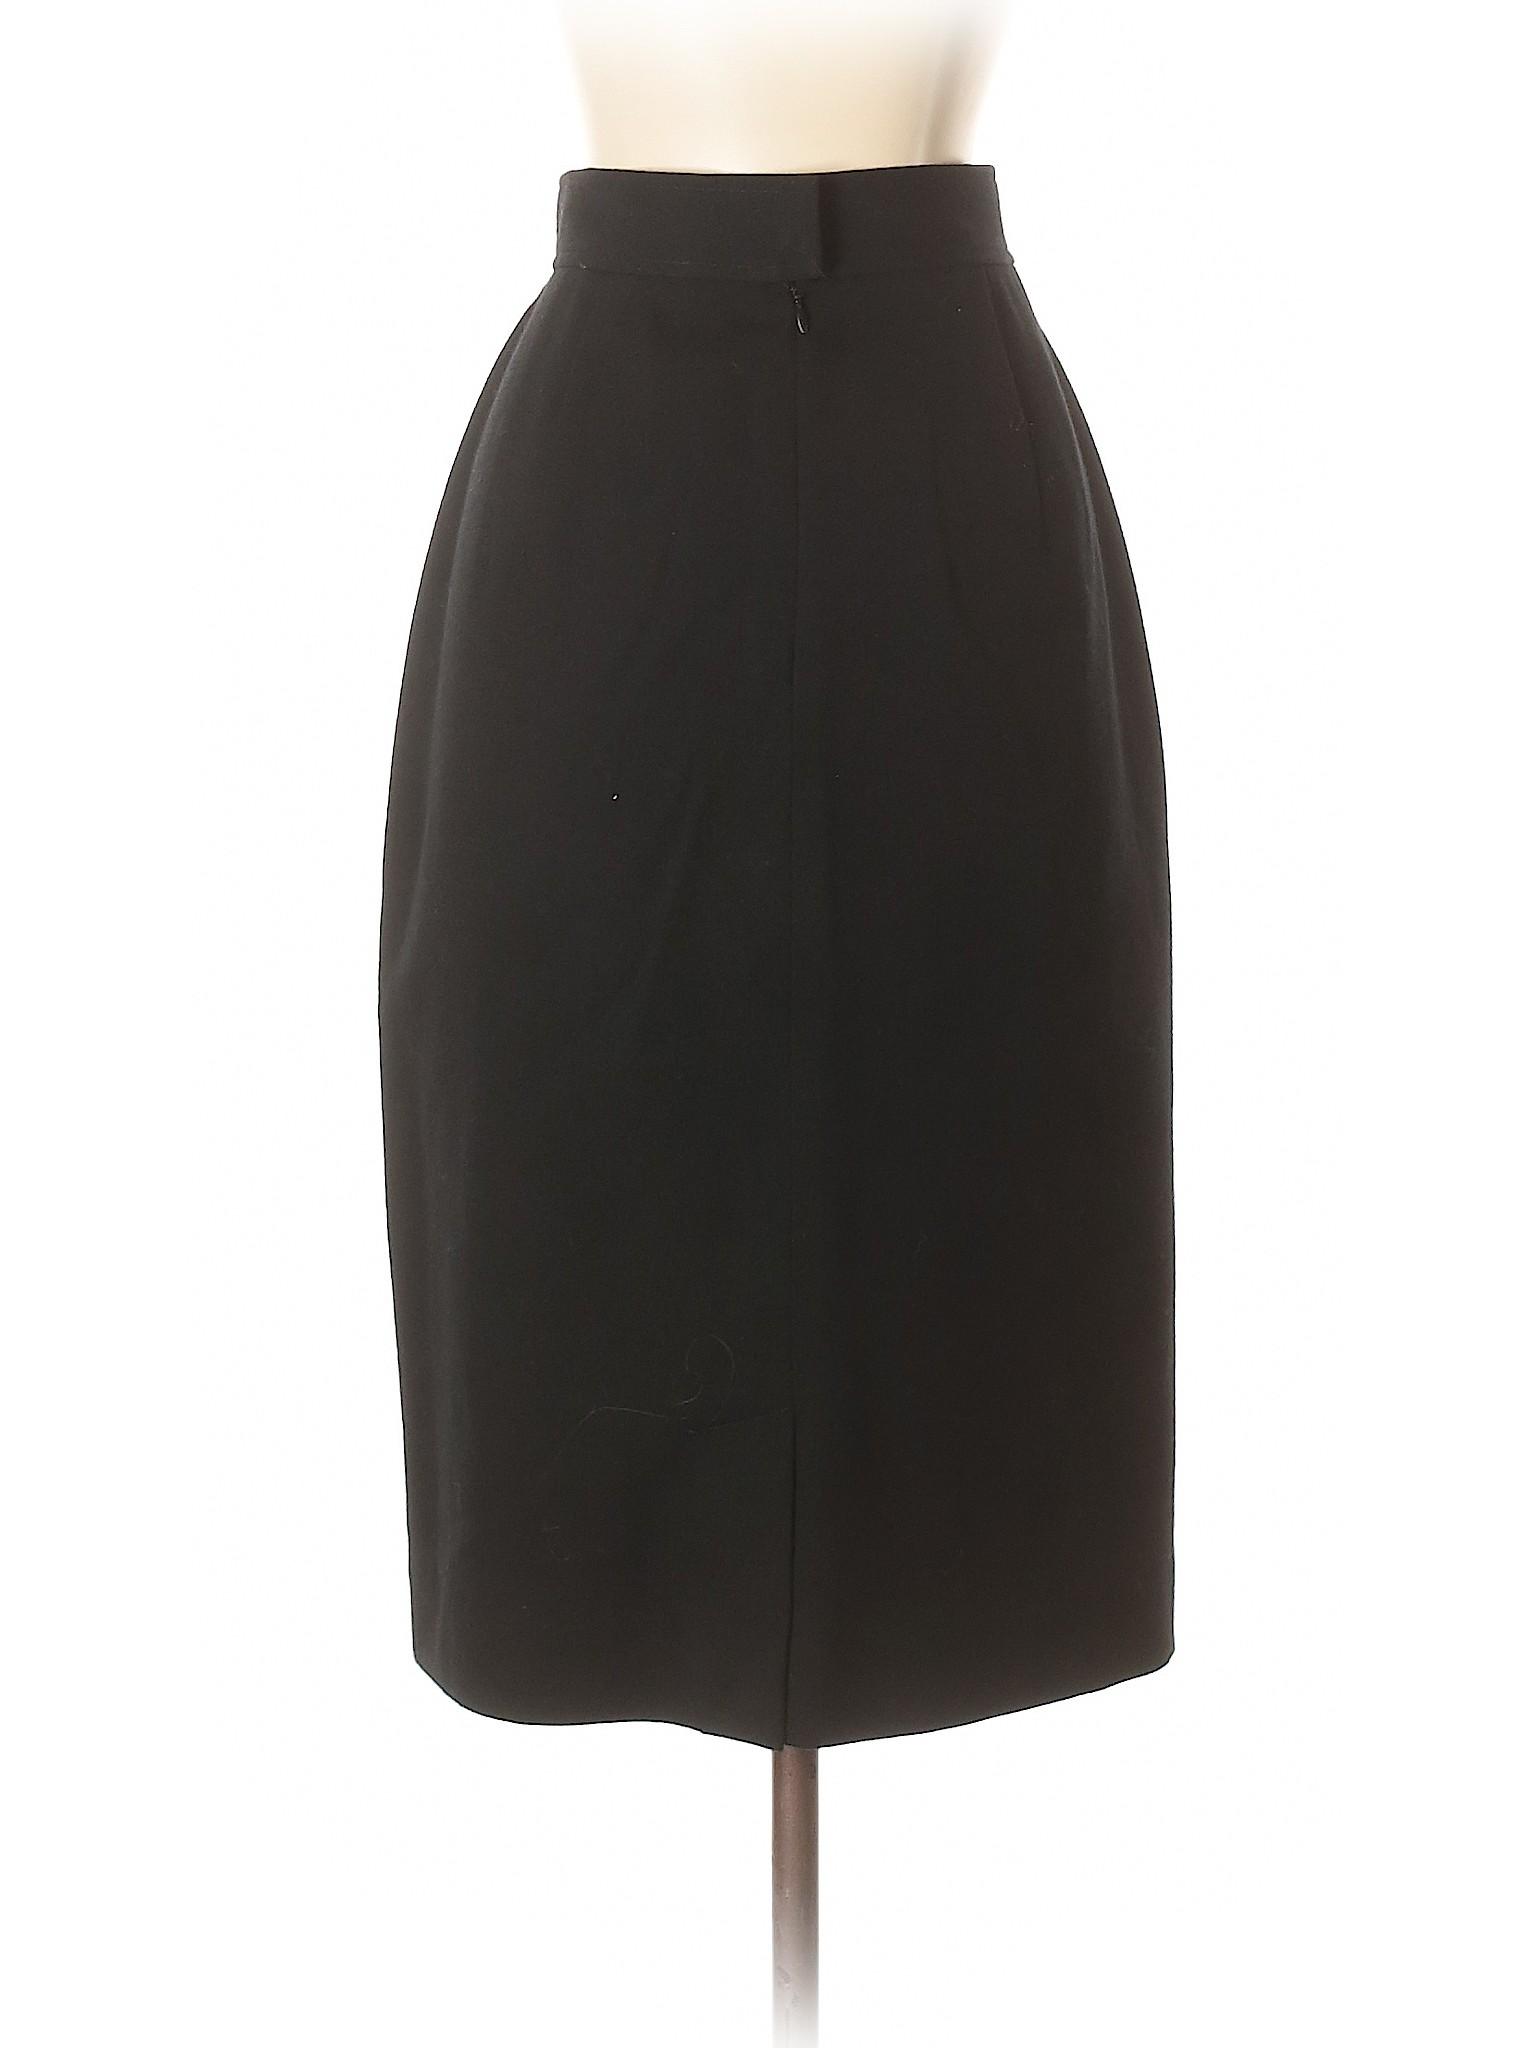 Skirt Skirt Boutique Boutique Boutique Wool Wool Wool gwqavw